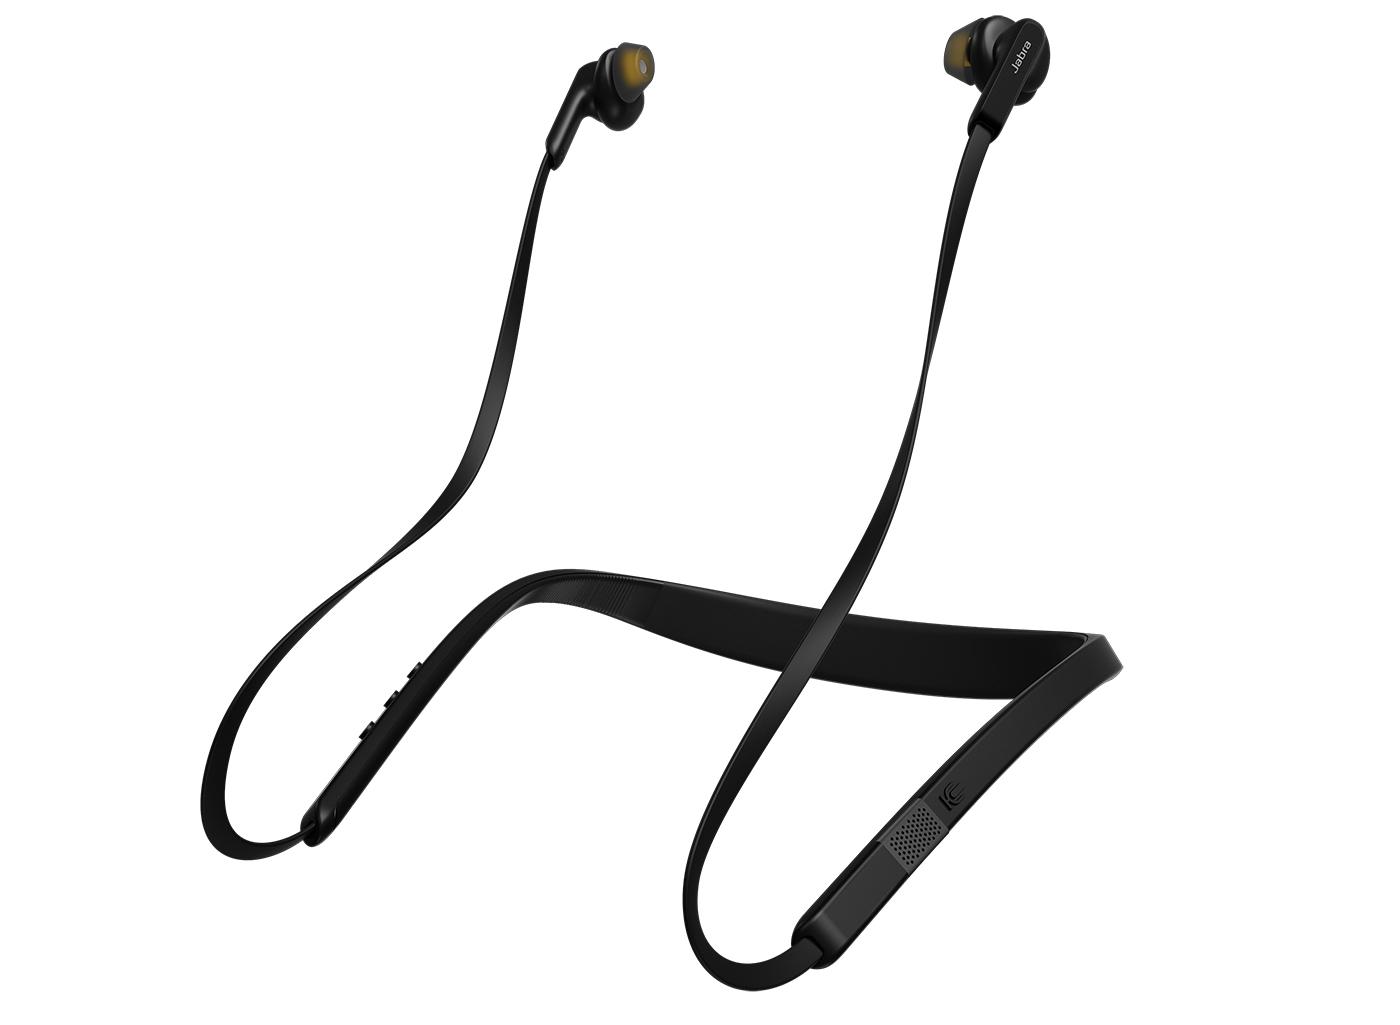 The Jabra Elite 25e Wireless In-Ear Headphones